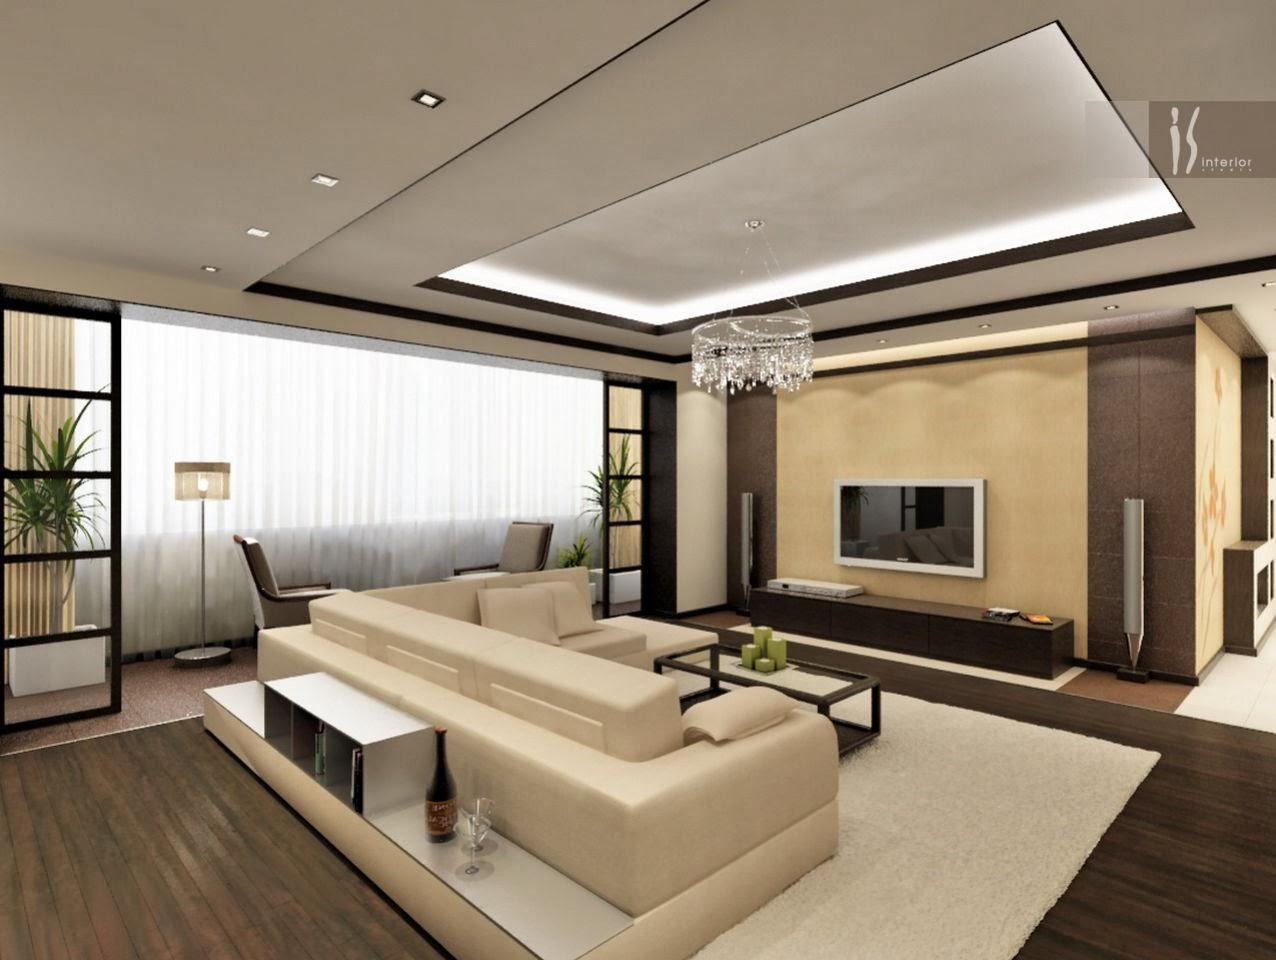 Living room interior design furniture for living room for Interior designs living rooms photos